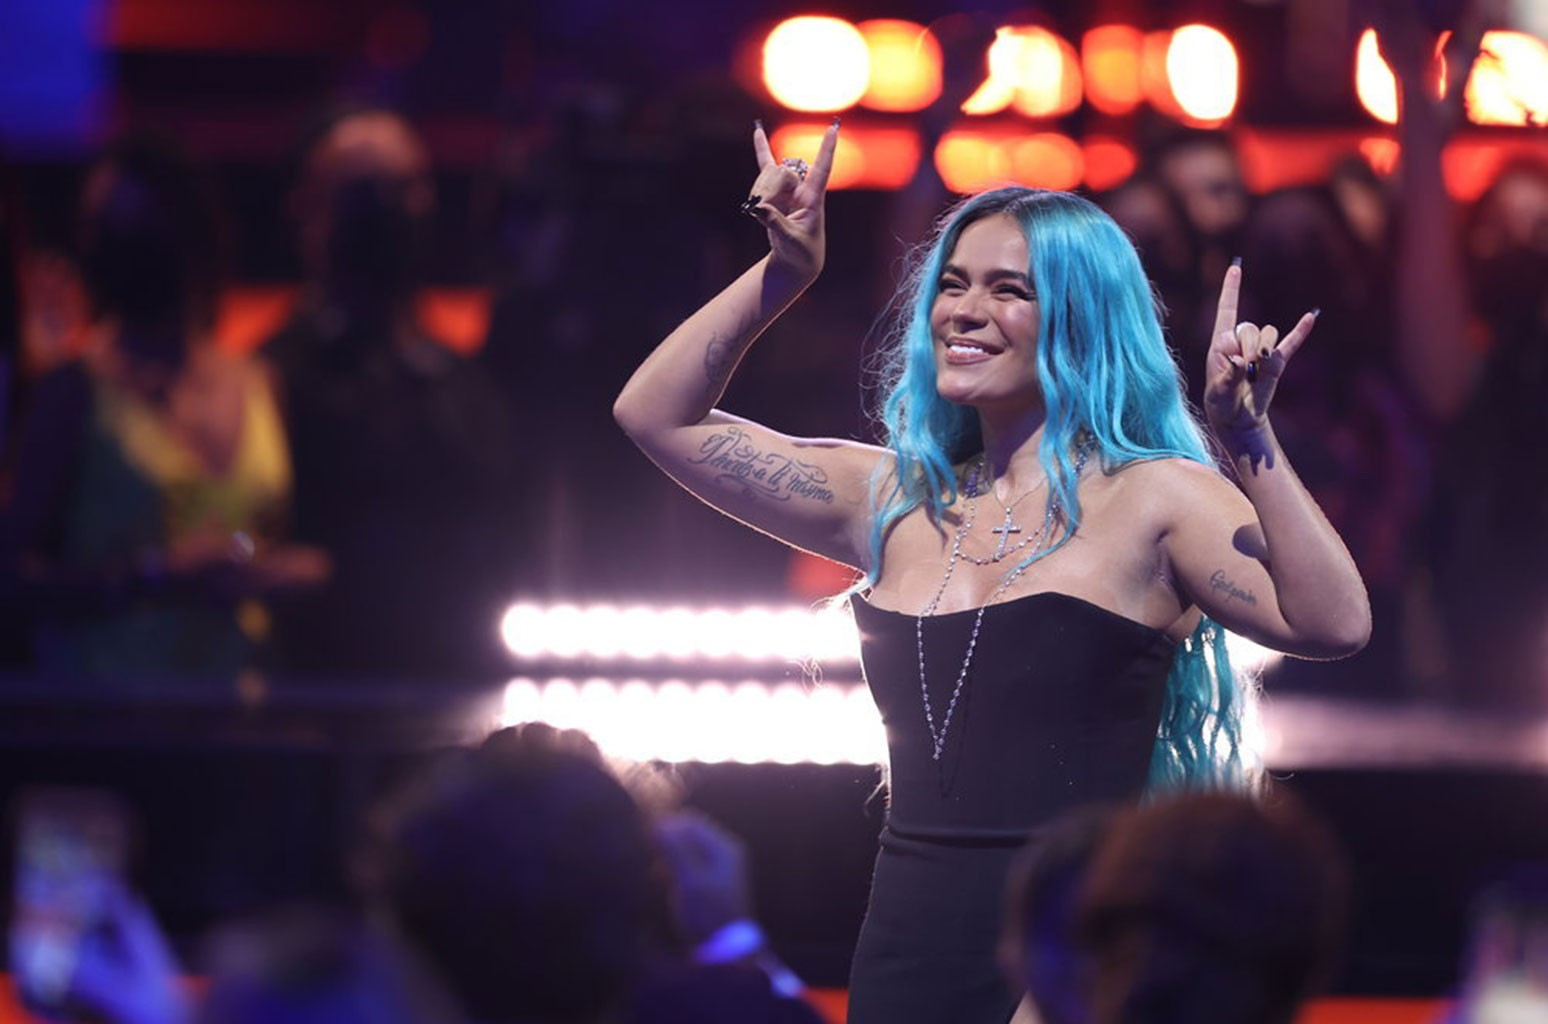 Bad Bunny Wins Big at 2021 Billboard Latin Music Awards: Full Winners List